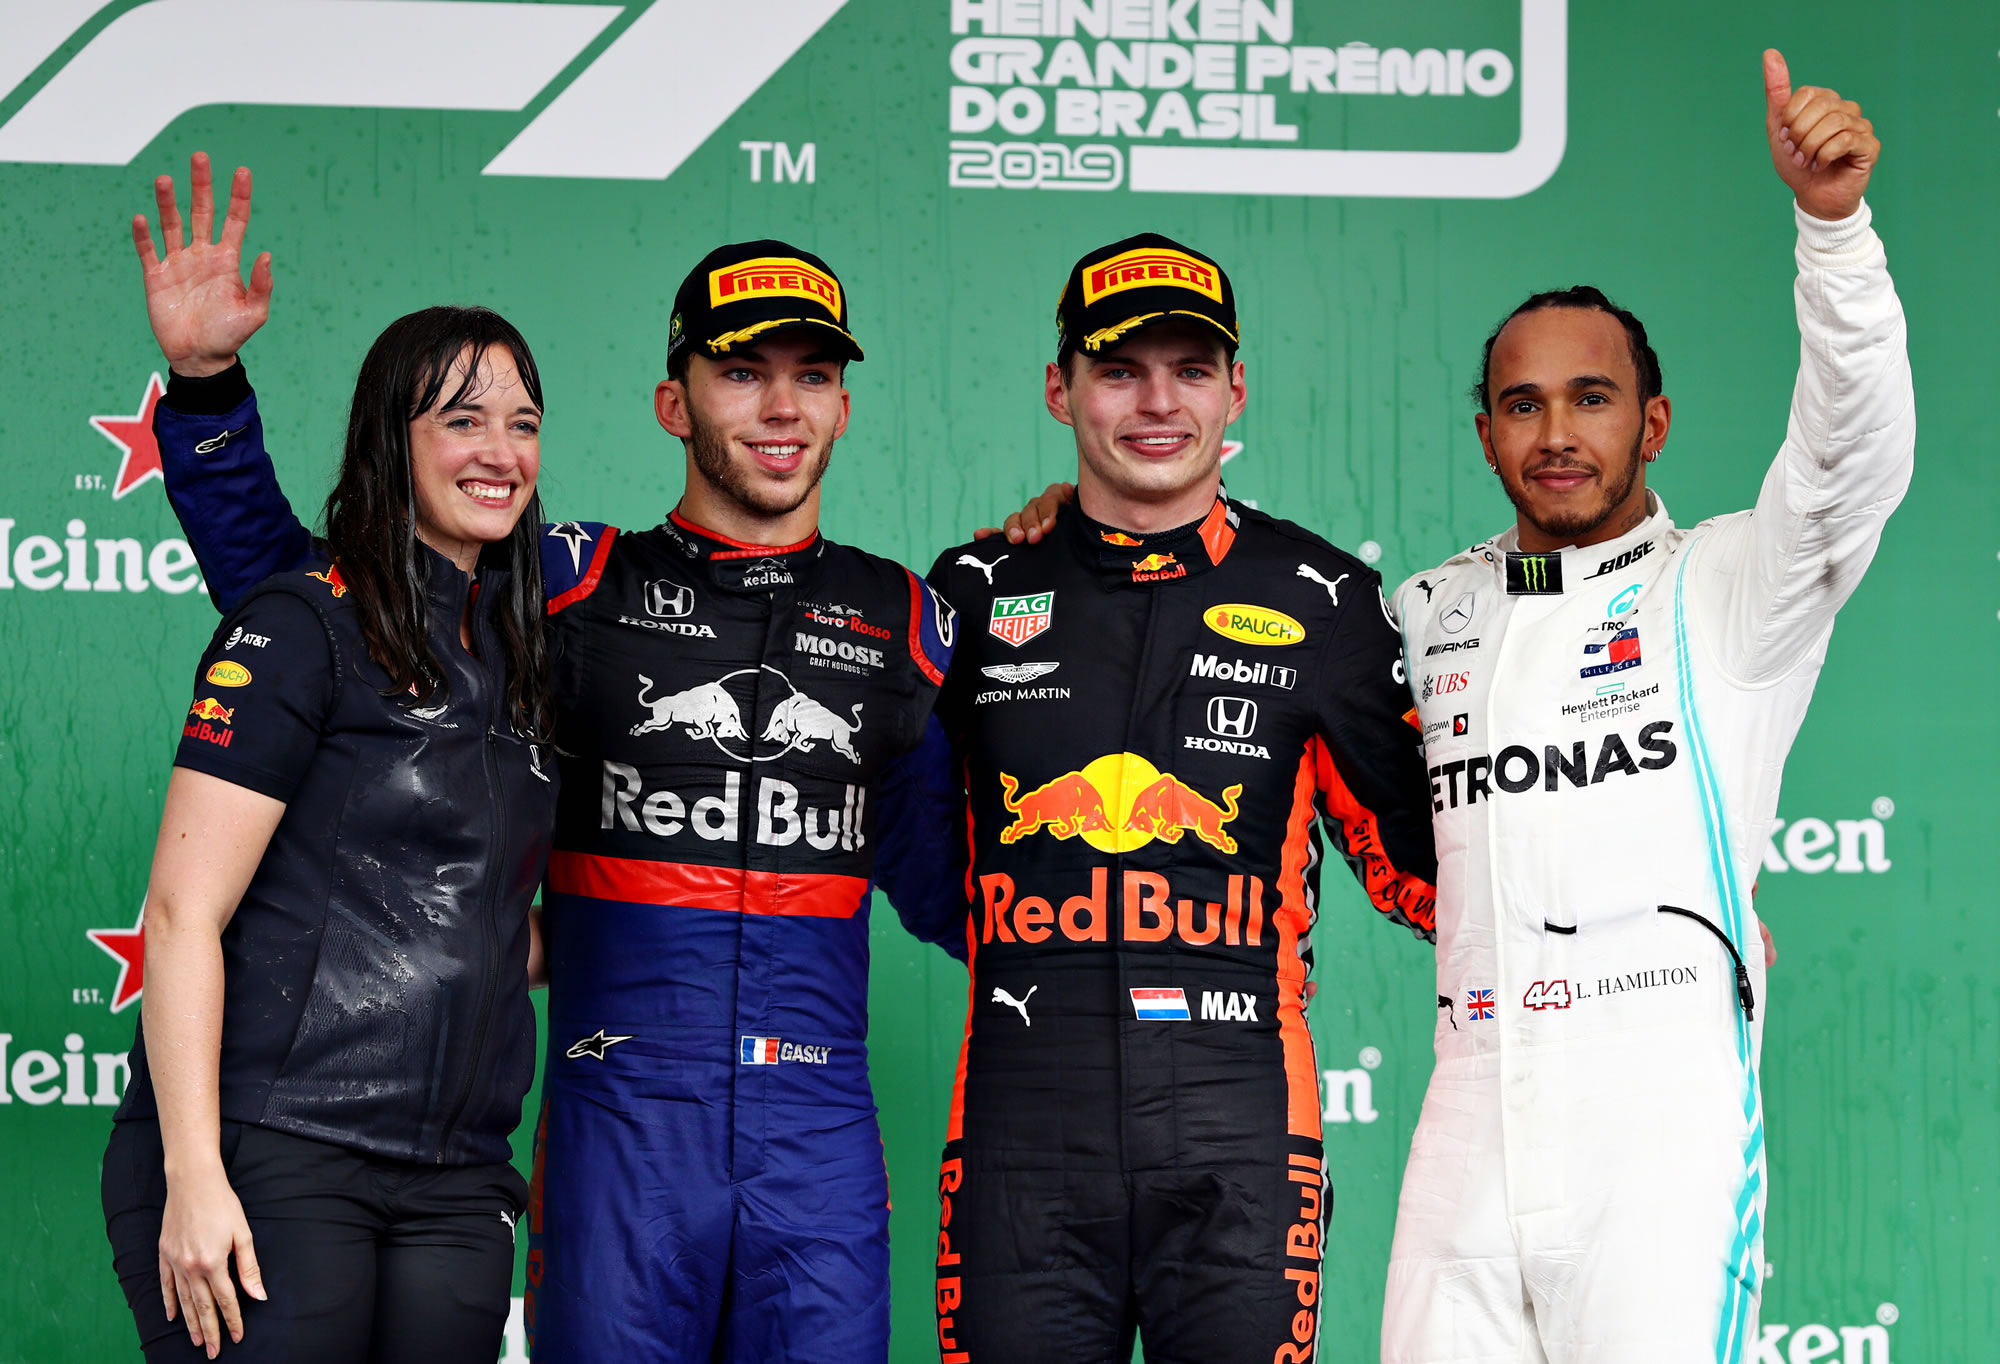 Brazil GP 2019 – Podium! 9